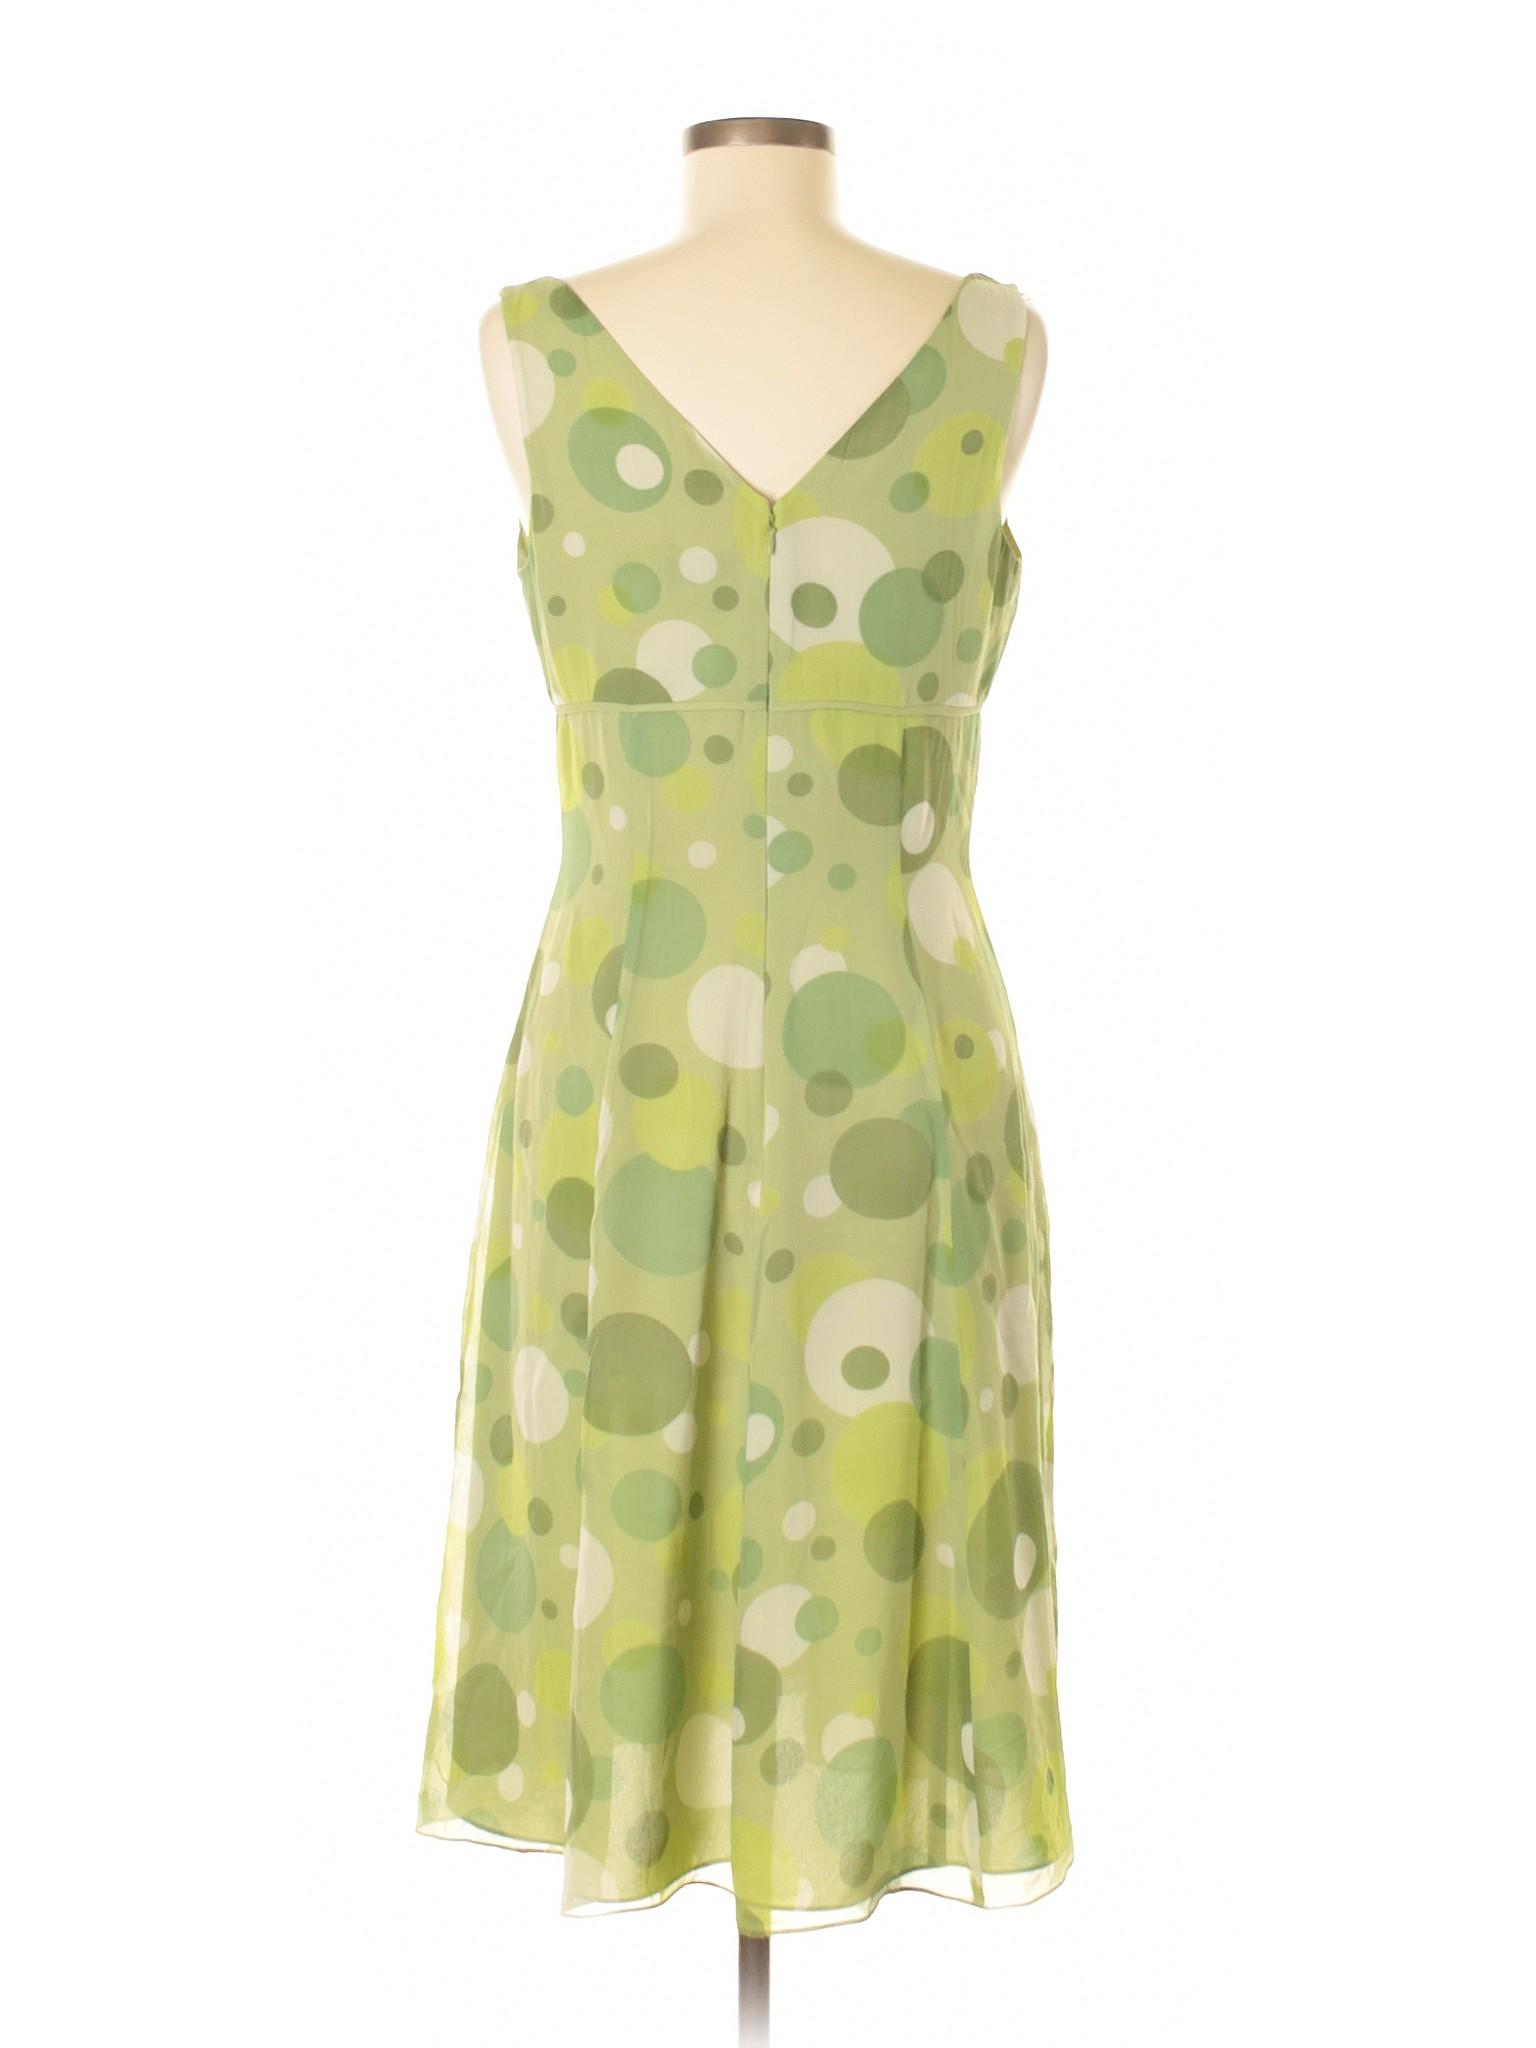 Winter Papell Adrianna Dress Casual Boutique OBqzdxXUwz